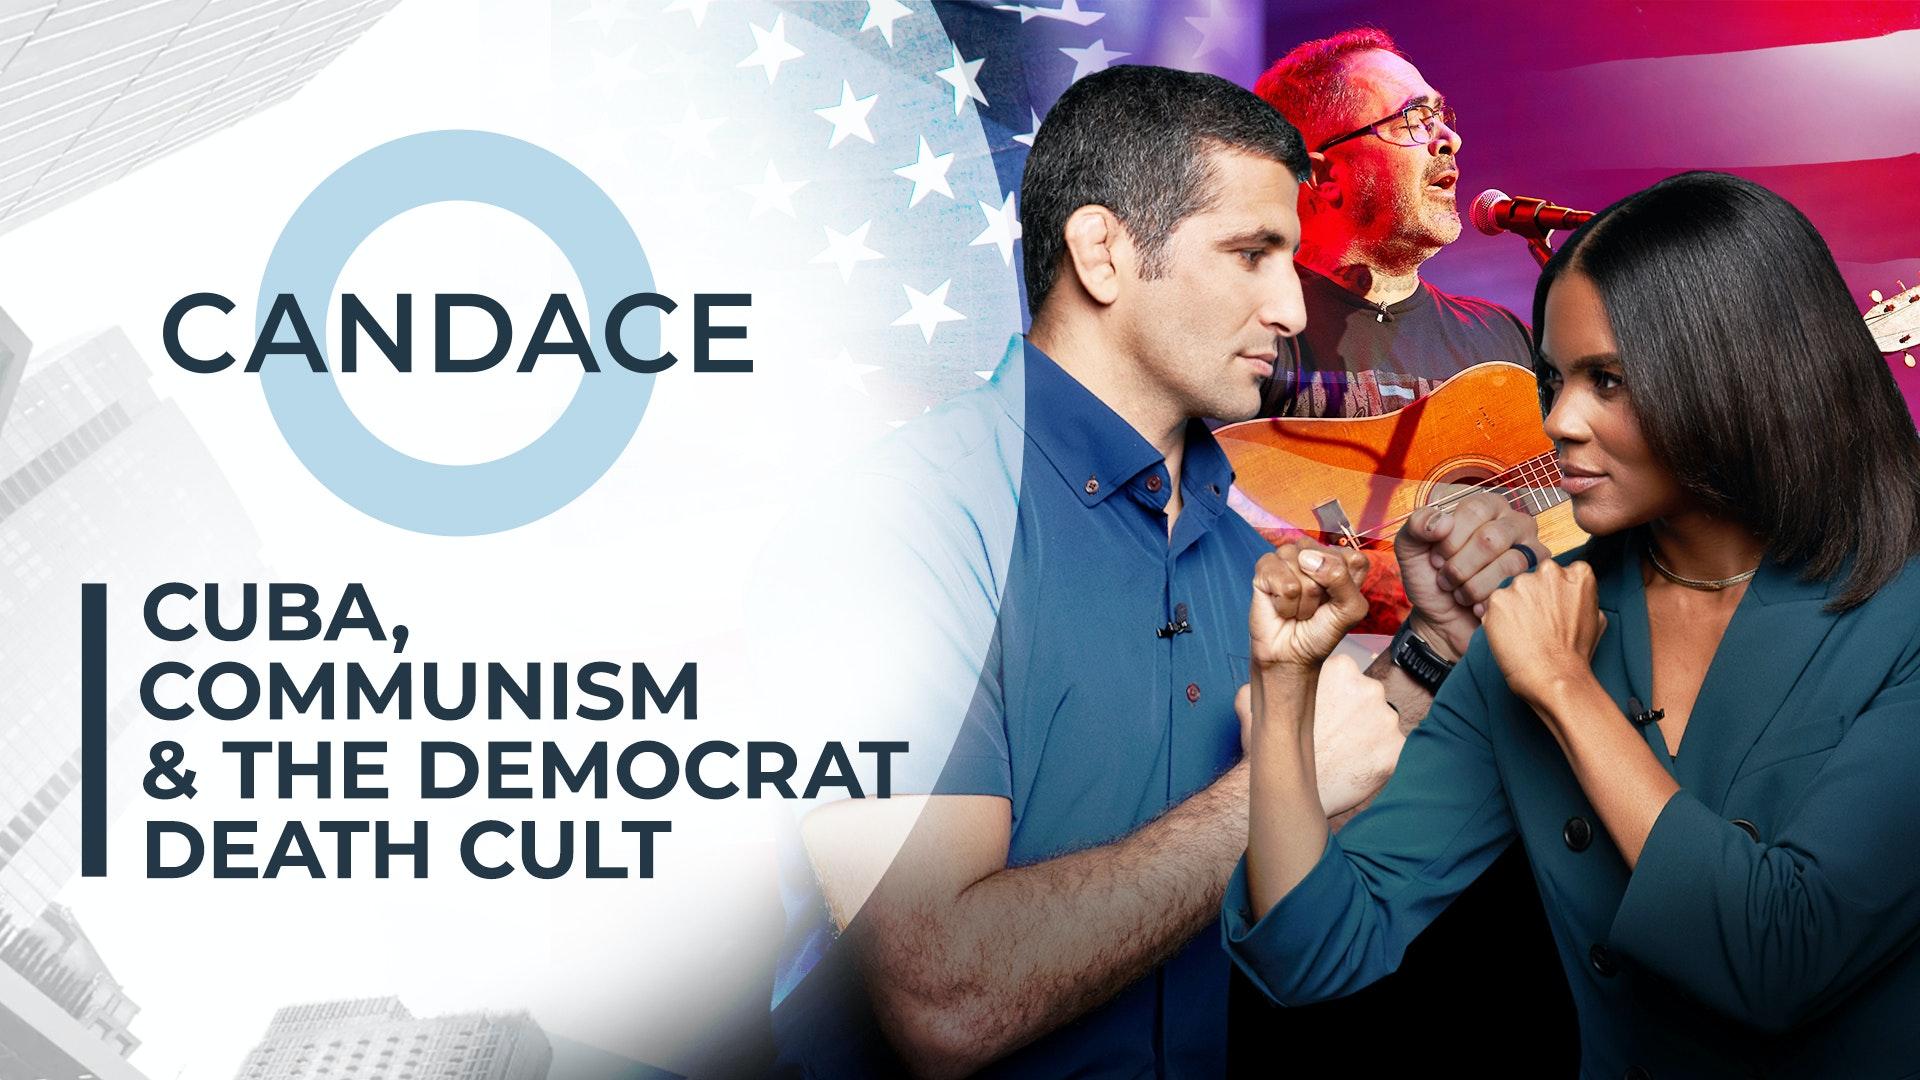 Episode 18 - Cuba, Communism & The Democrat Death Cult